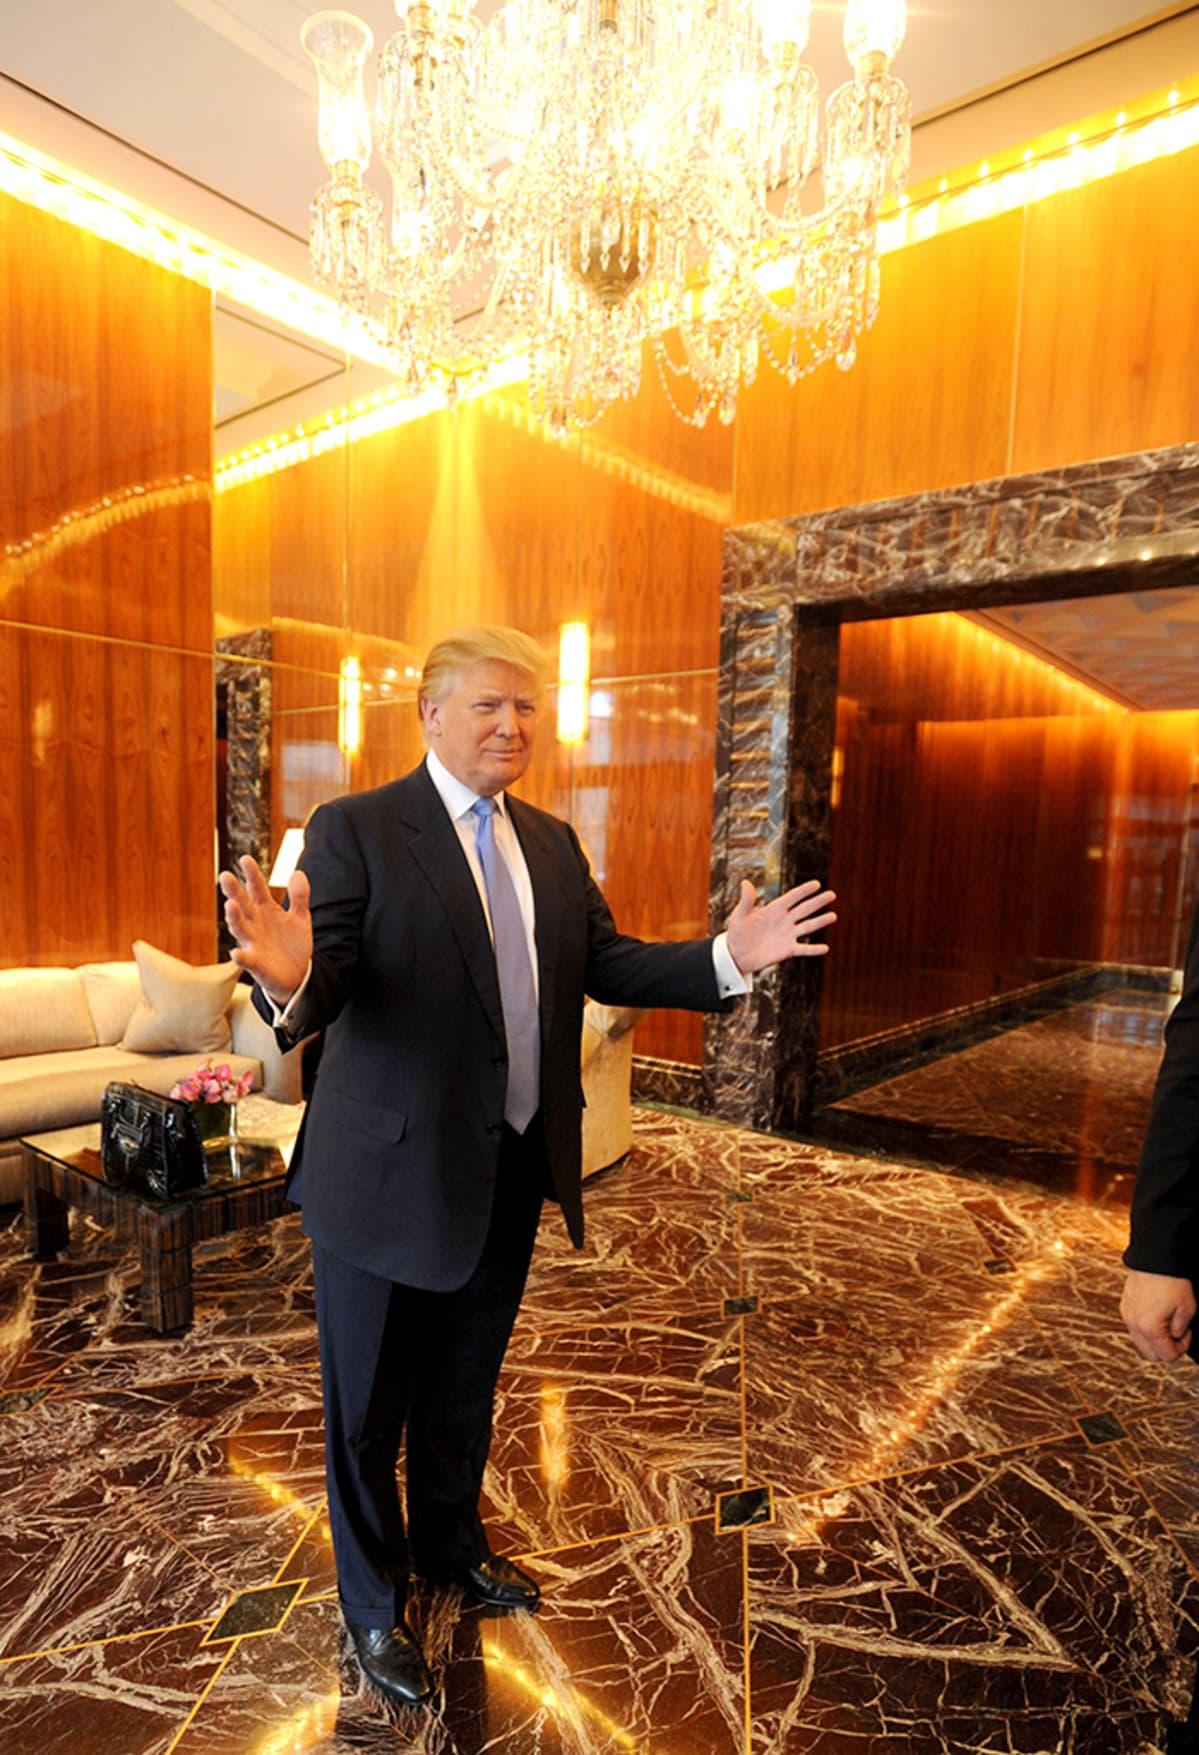 Donald trump hotelissaan.